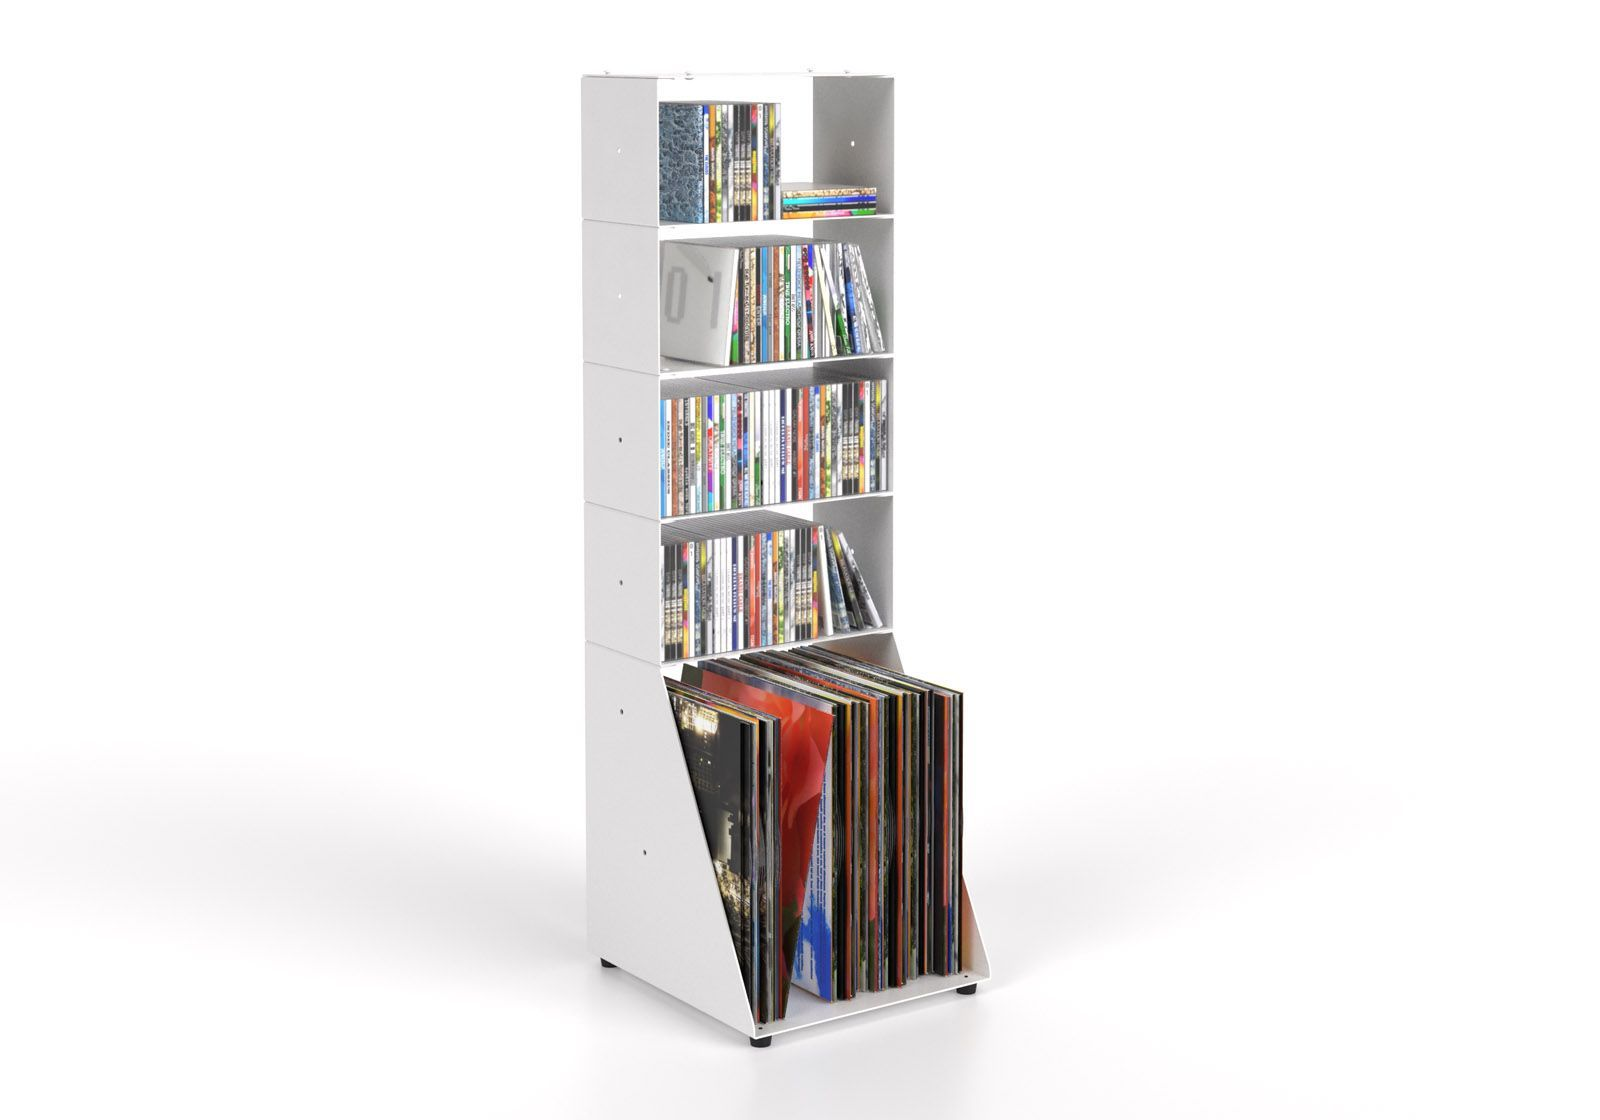 Estanteria CD y Vinilo 30 cm - metral blanco - 5 niveles